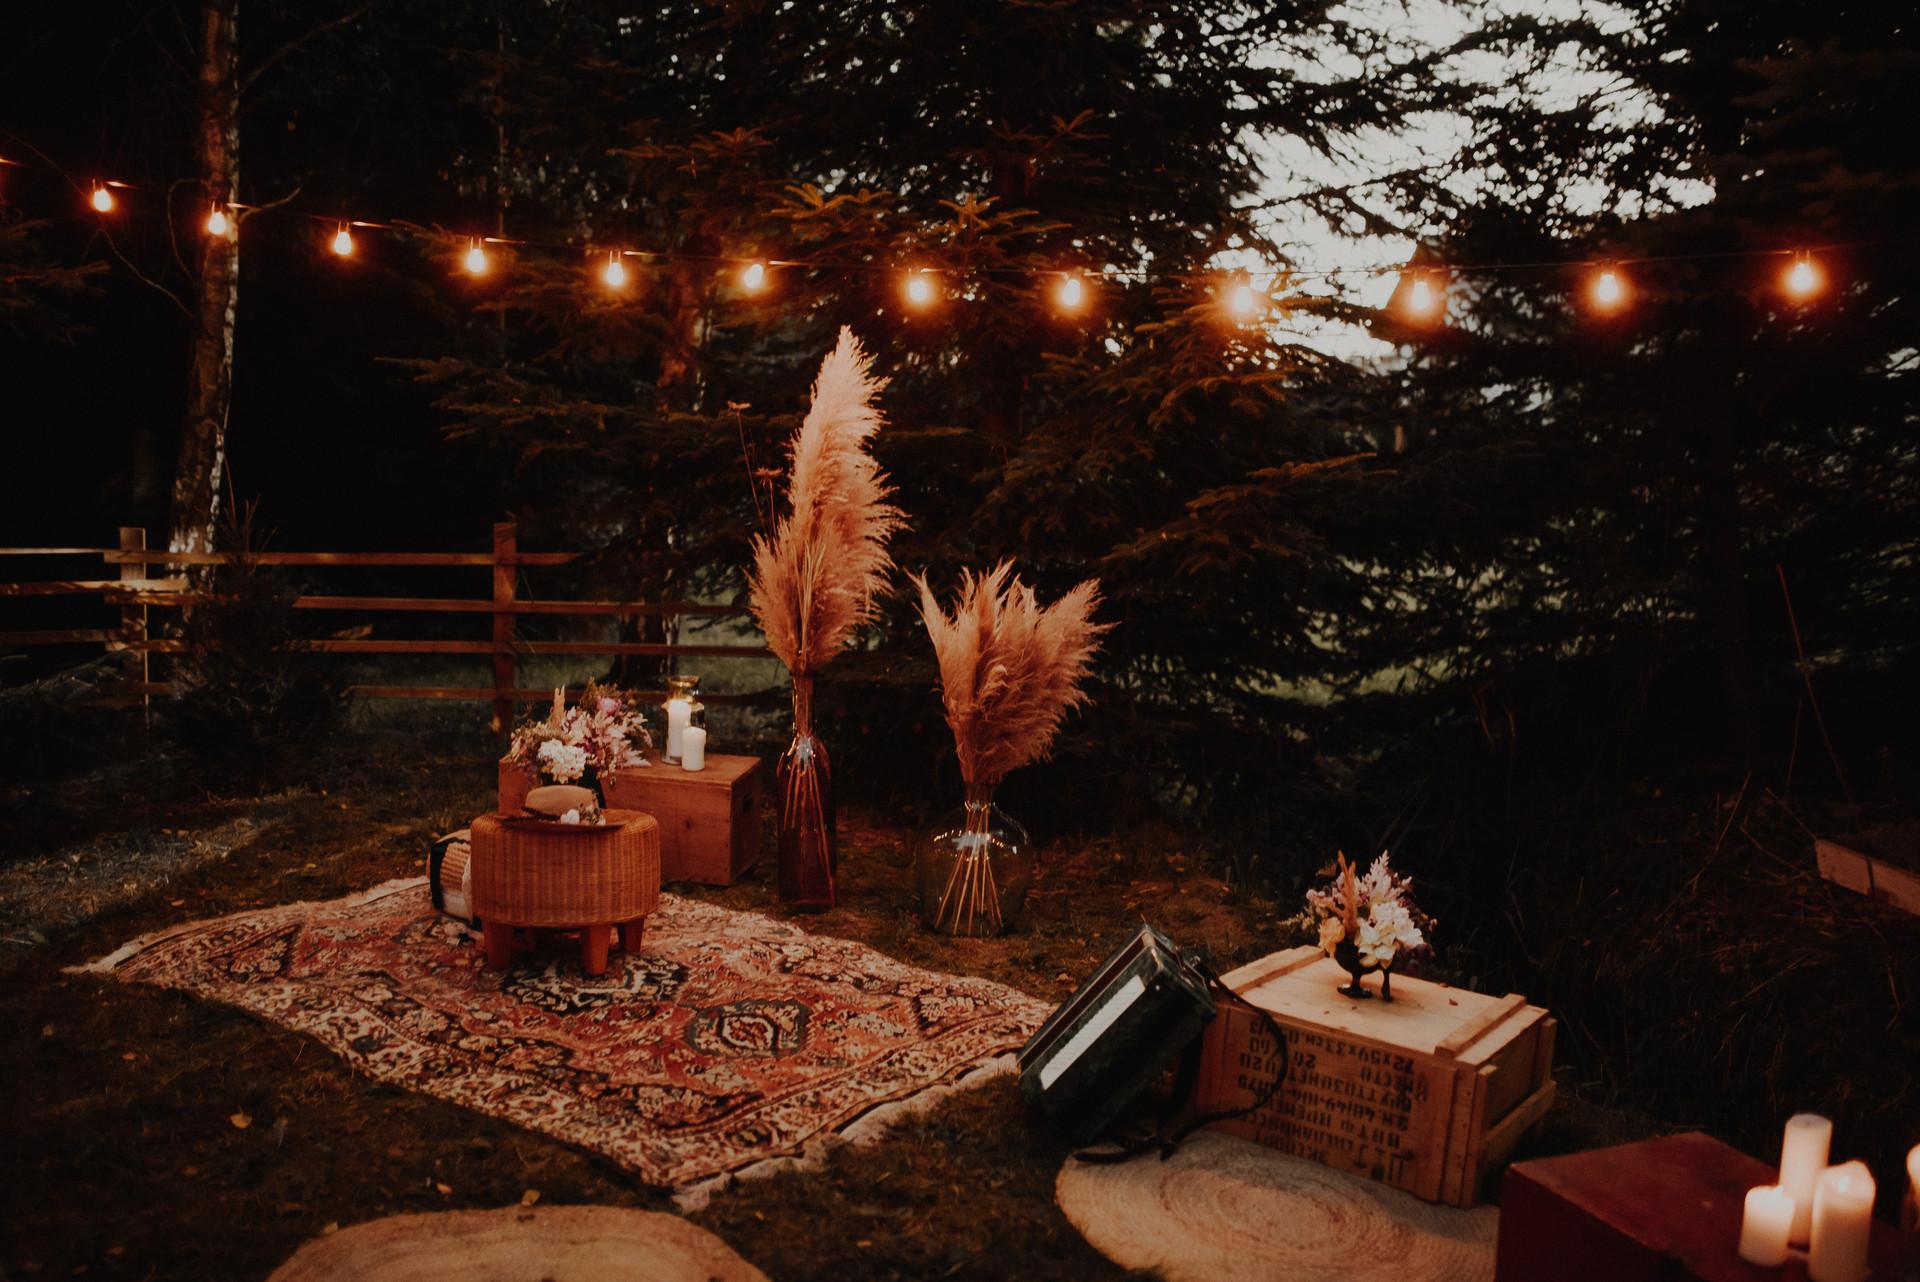 strefa relaksu boho na event i wesele